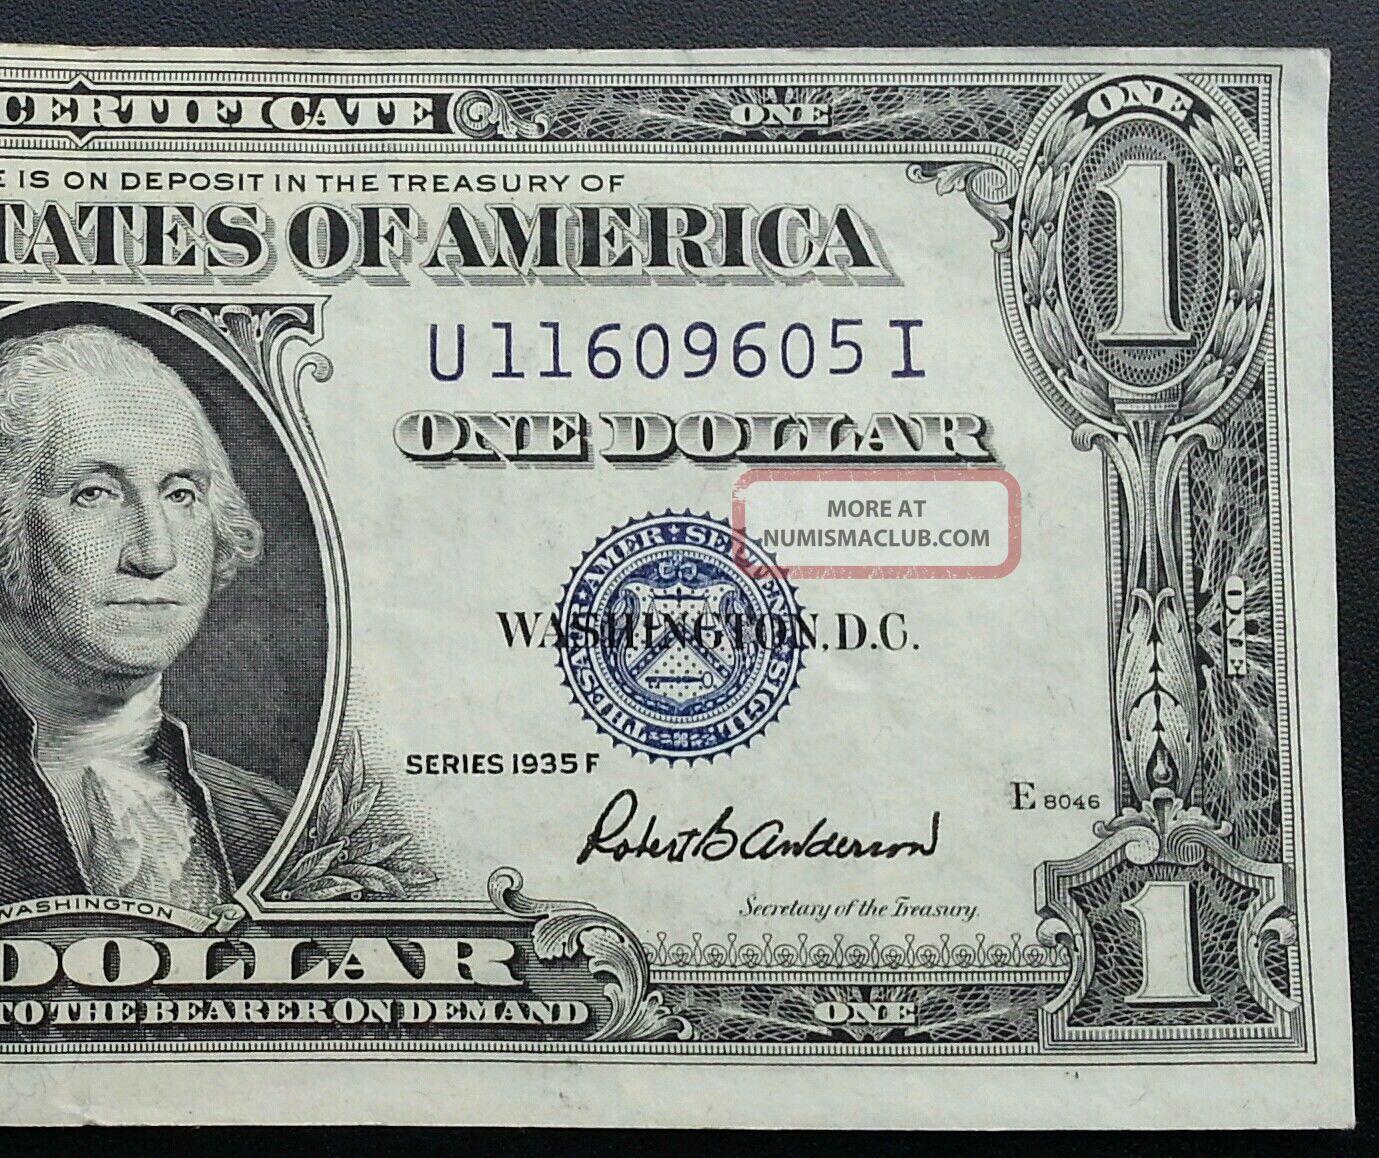 1935 F Silver Certificate Blue Seal One Dollar Bill Unc Crisp Off